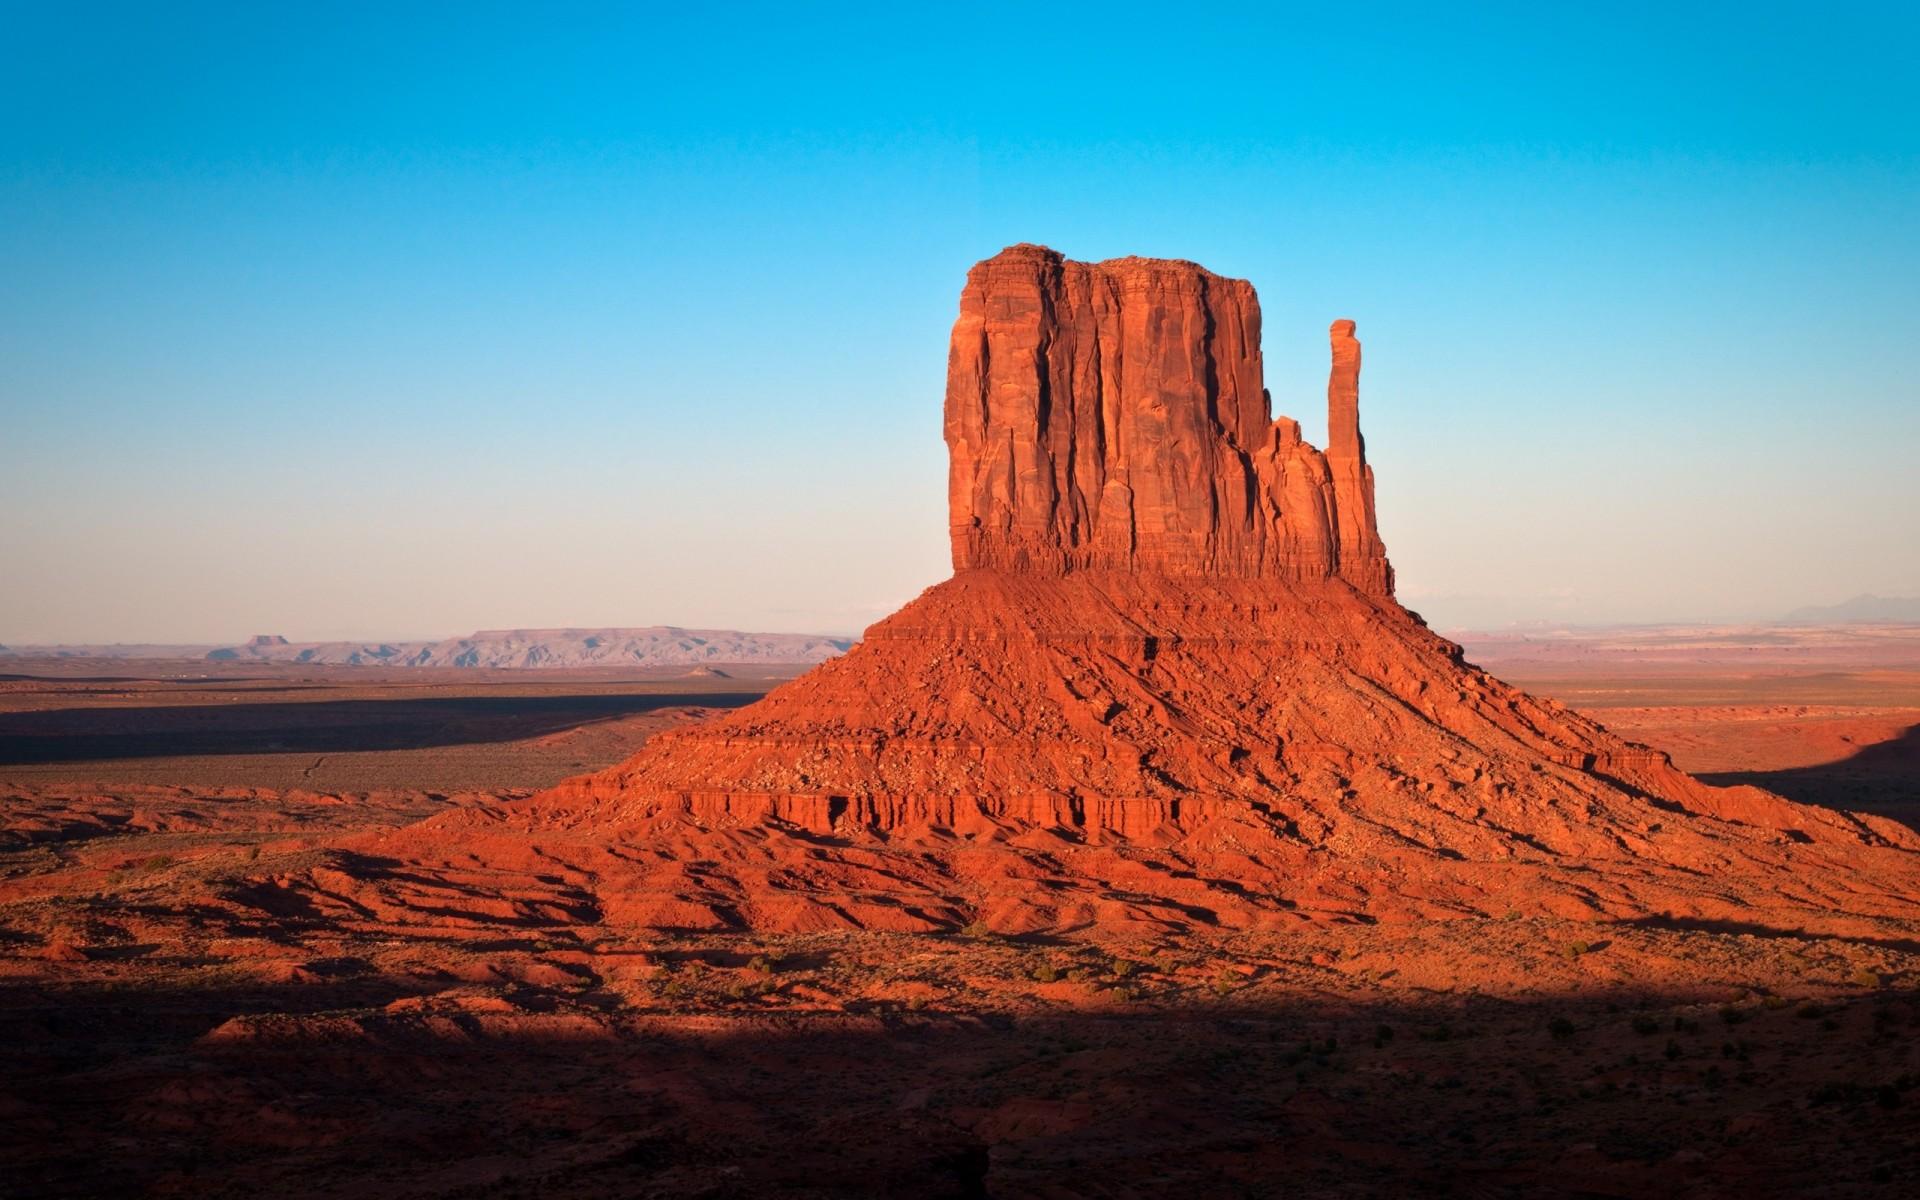 landscapes desert arizona monument valley rock formations wallpaper 1920x1200